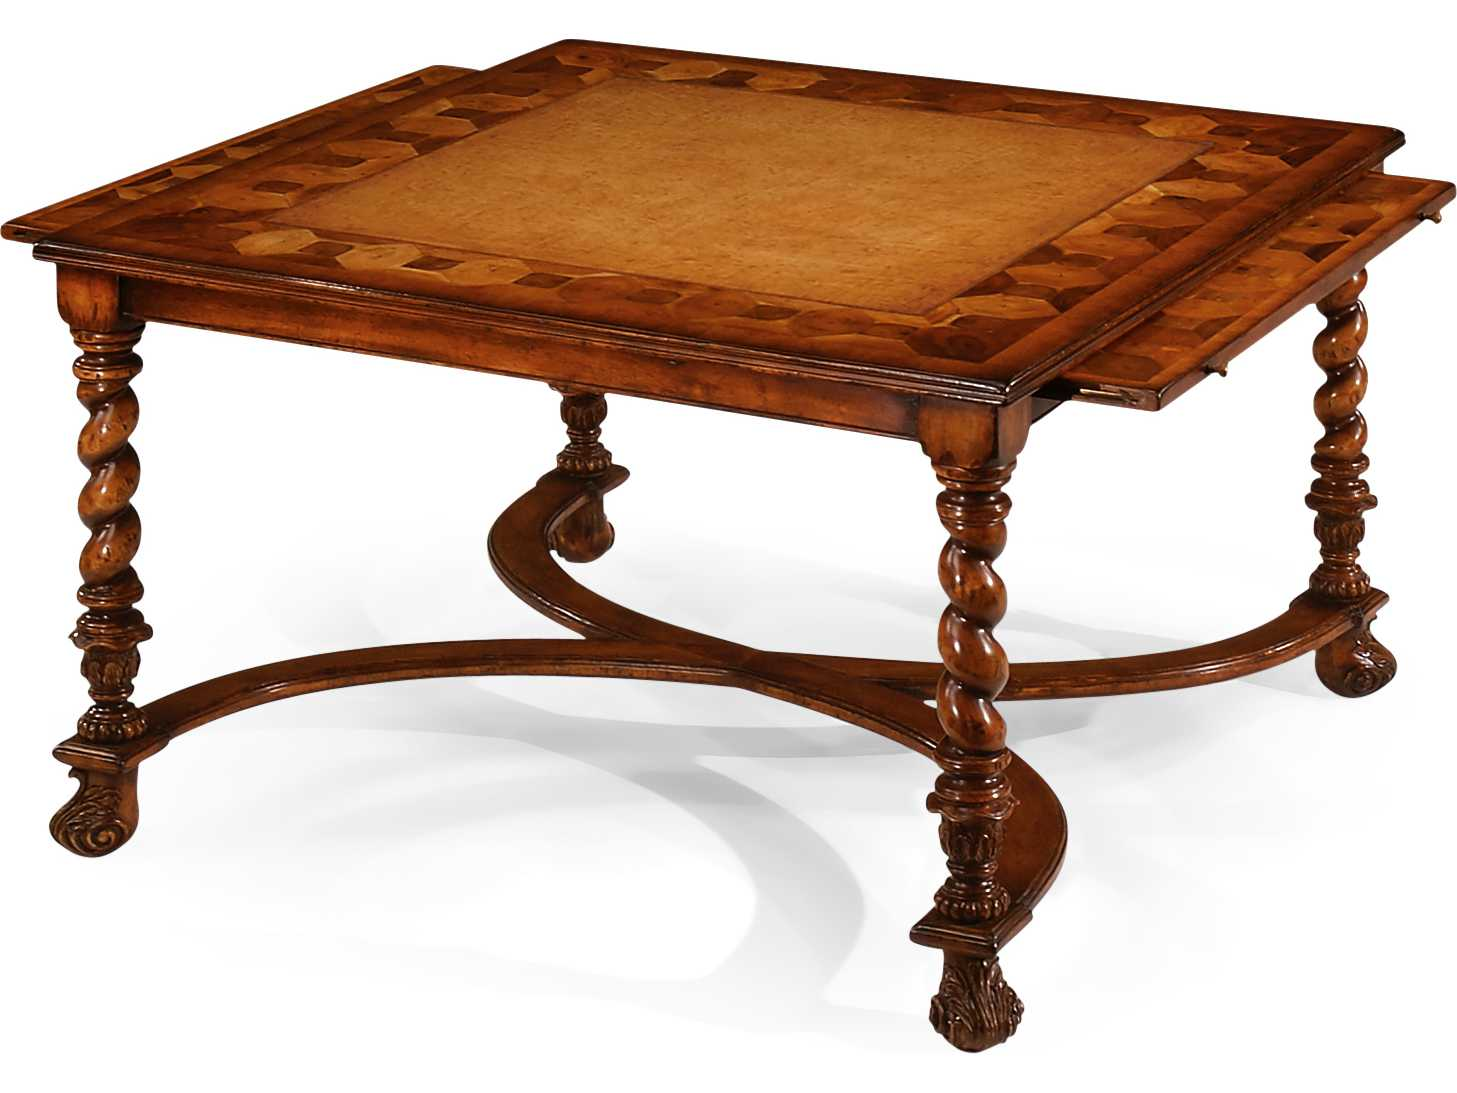 Jonathan Charles Windsor Medium Walnut 36 5 Square Coffee Table Jc492098